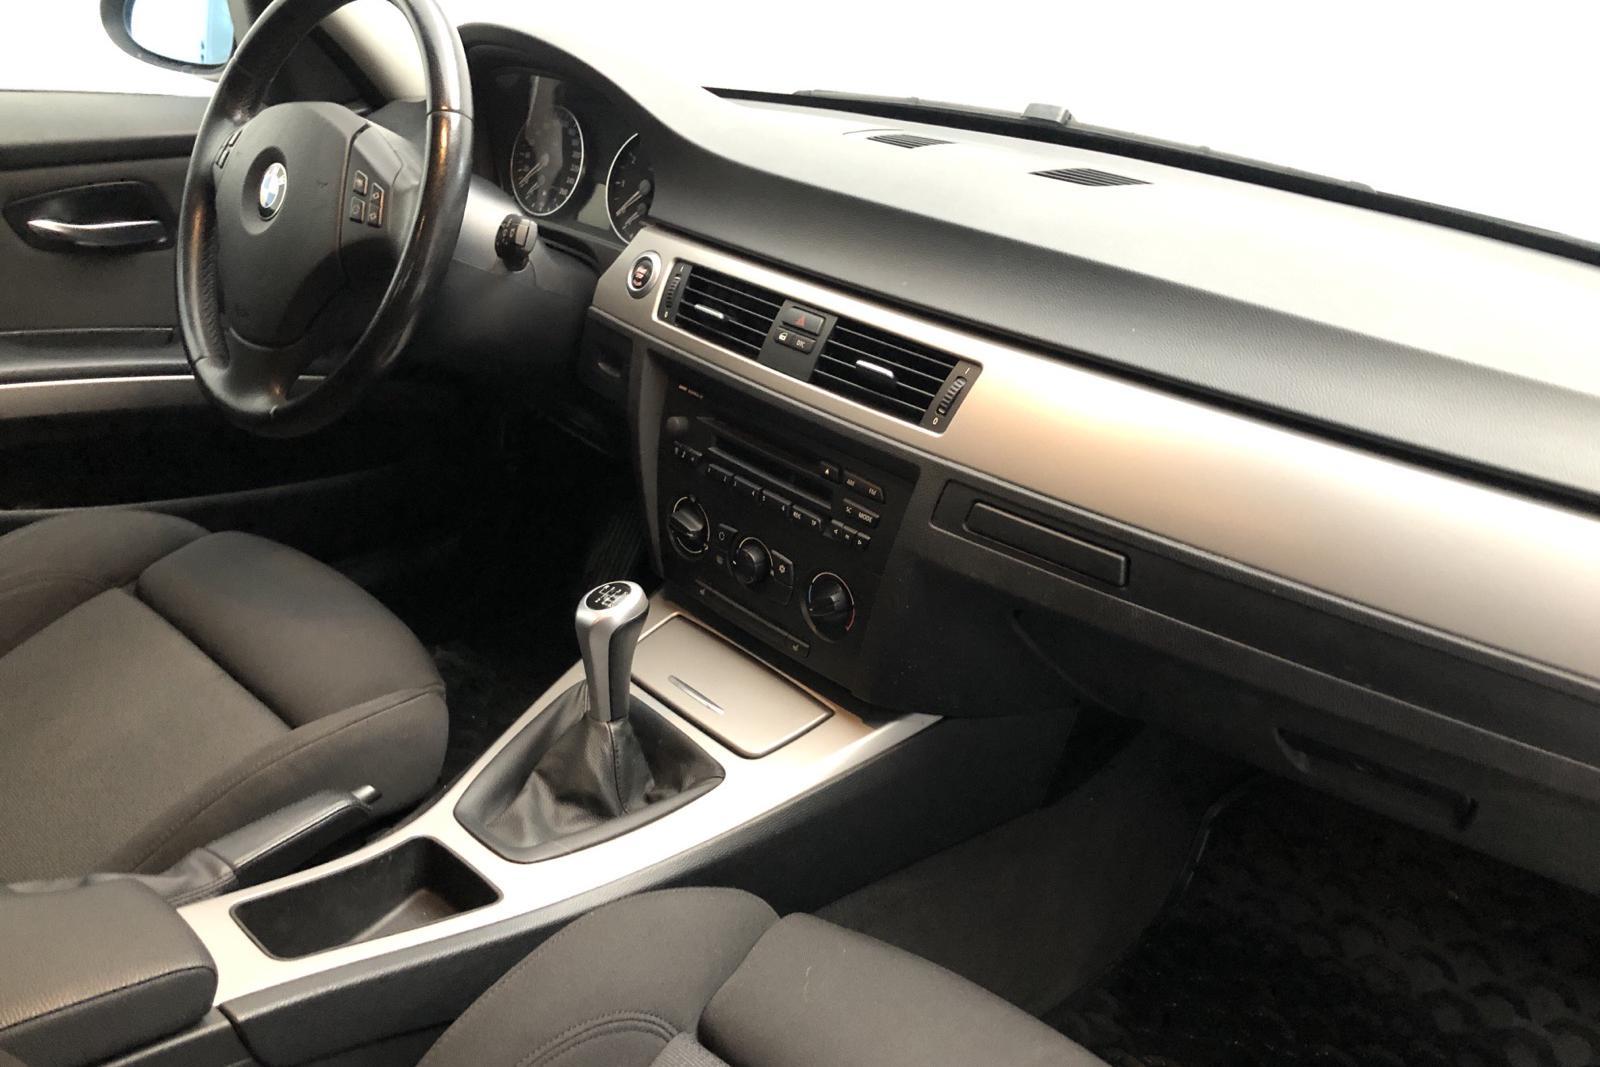 BMW 320i Touring, E91 (150hk) - 13 000 mil - Manuell - Light Grey - 2006